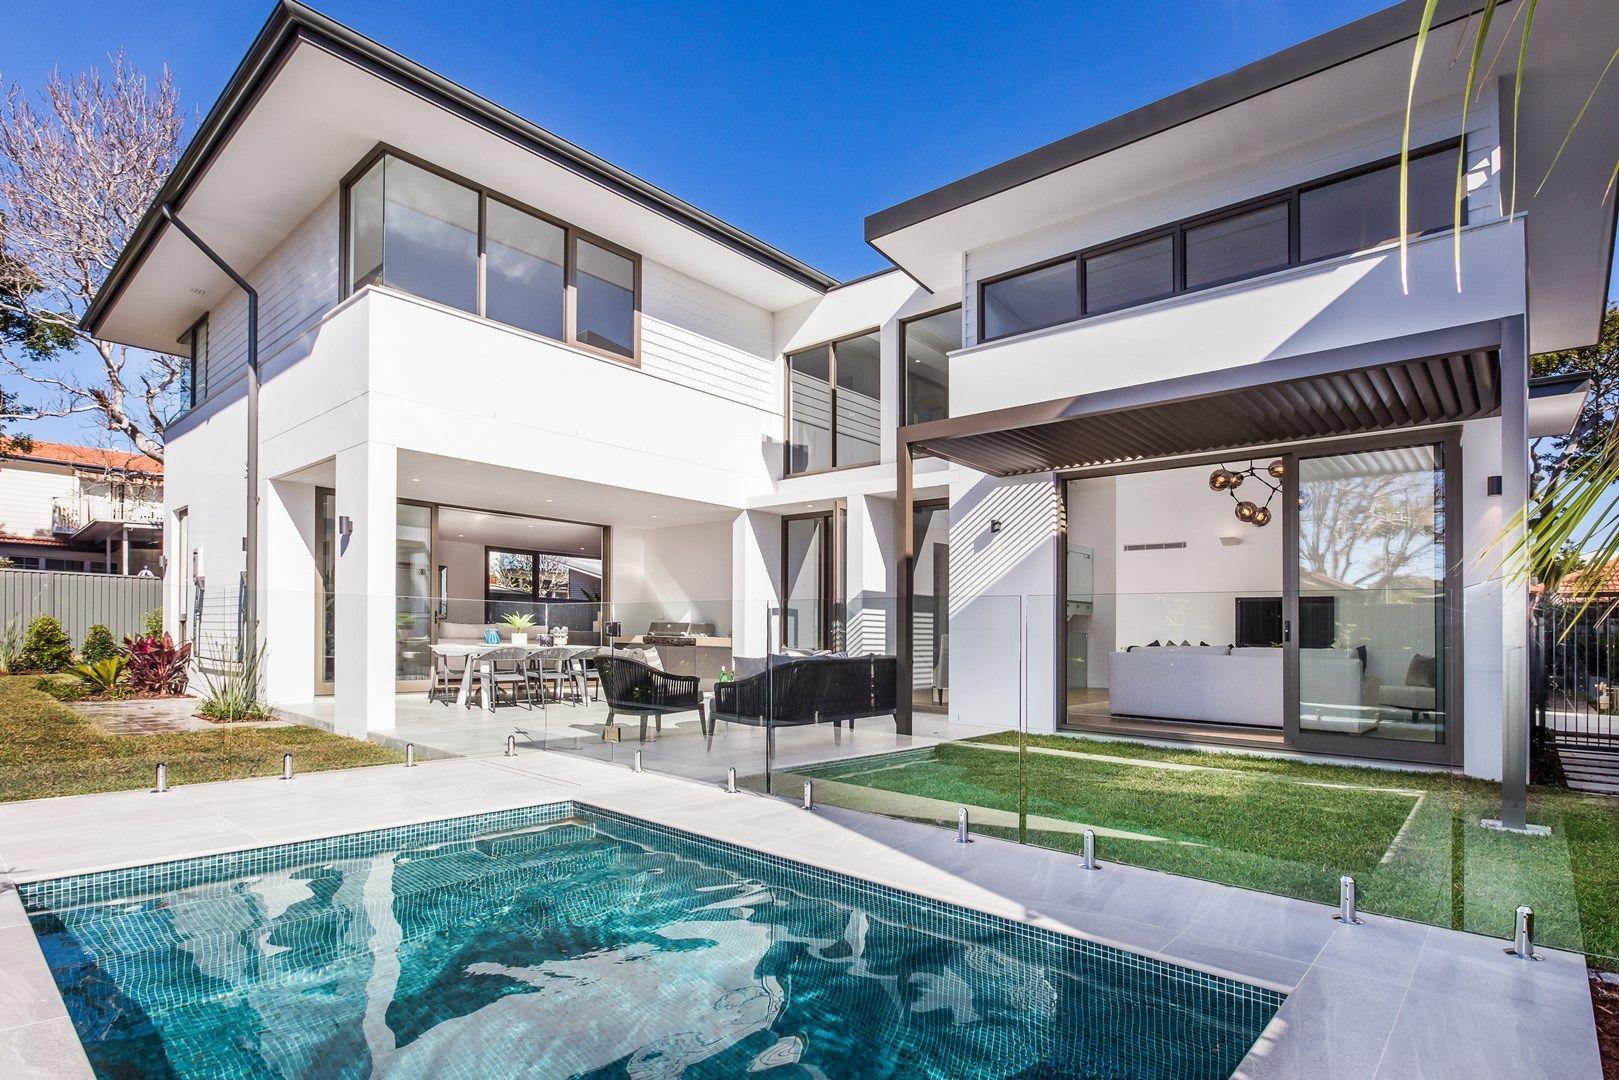 Beach House 3 - 40 Trevellyan St, Cronulla NSW 2230, Image 0